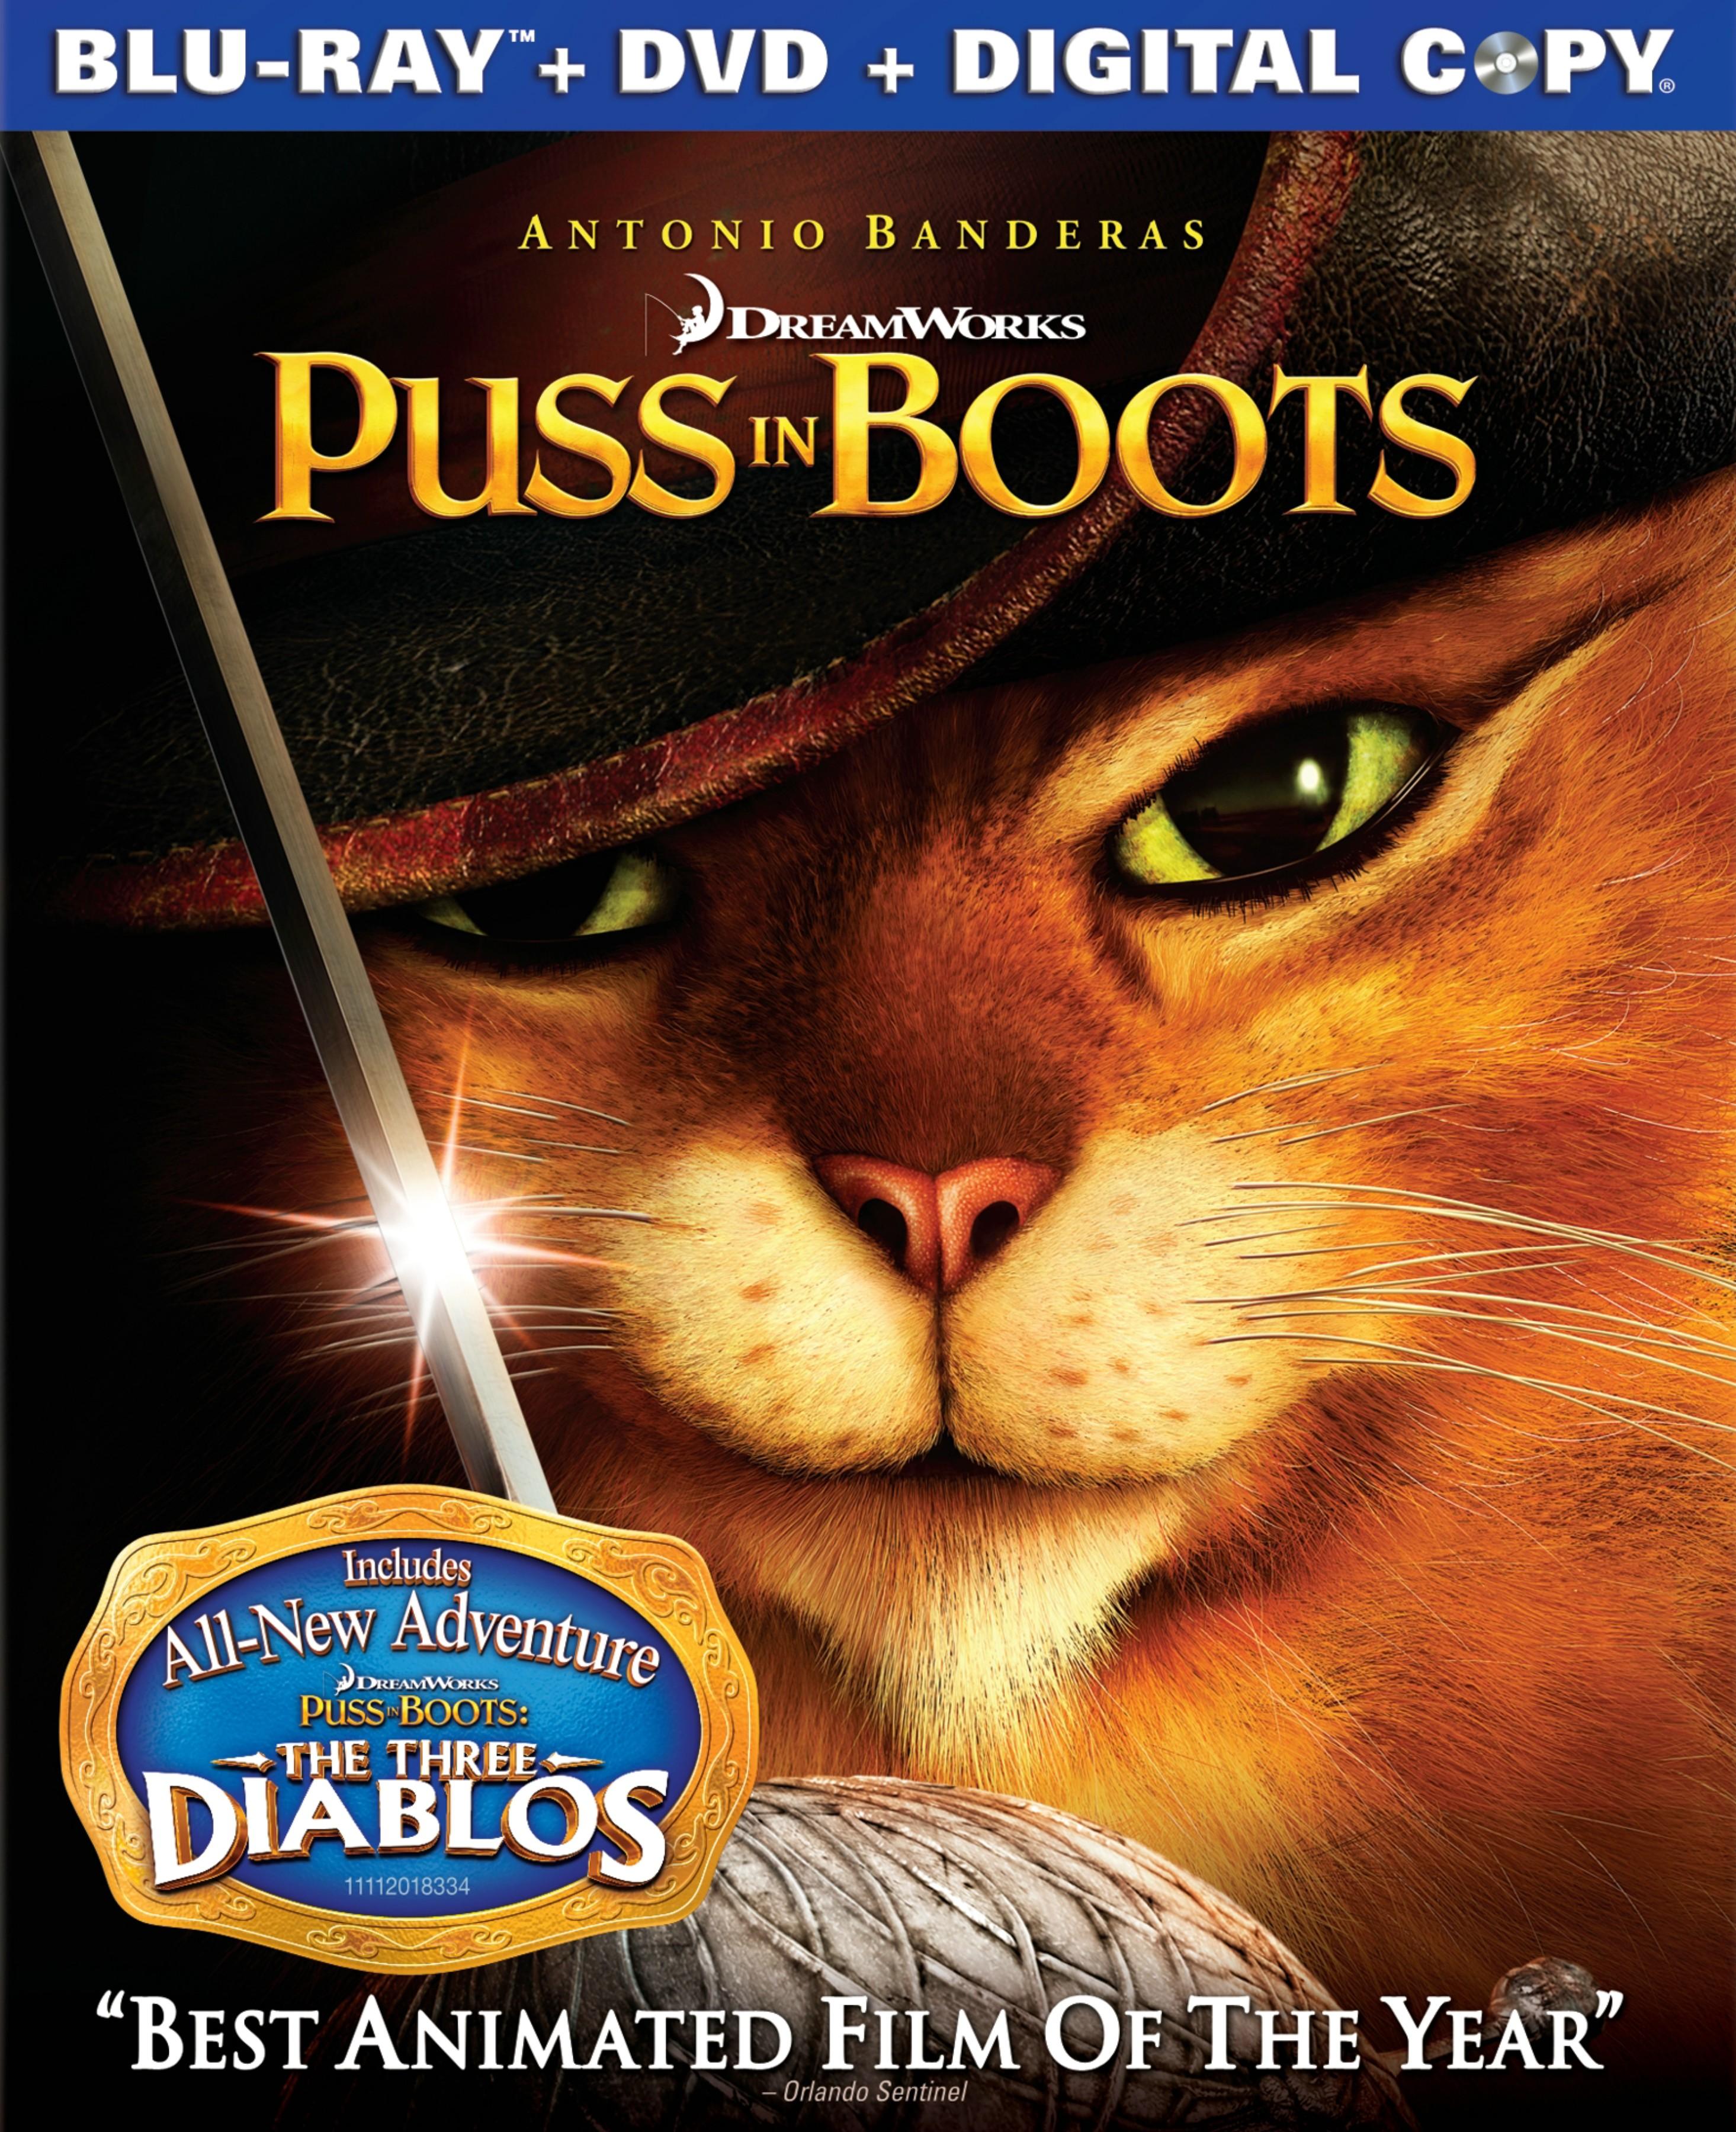 Puss in Boots Blu ray Box Art